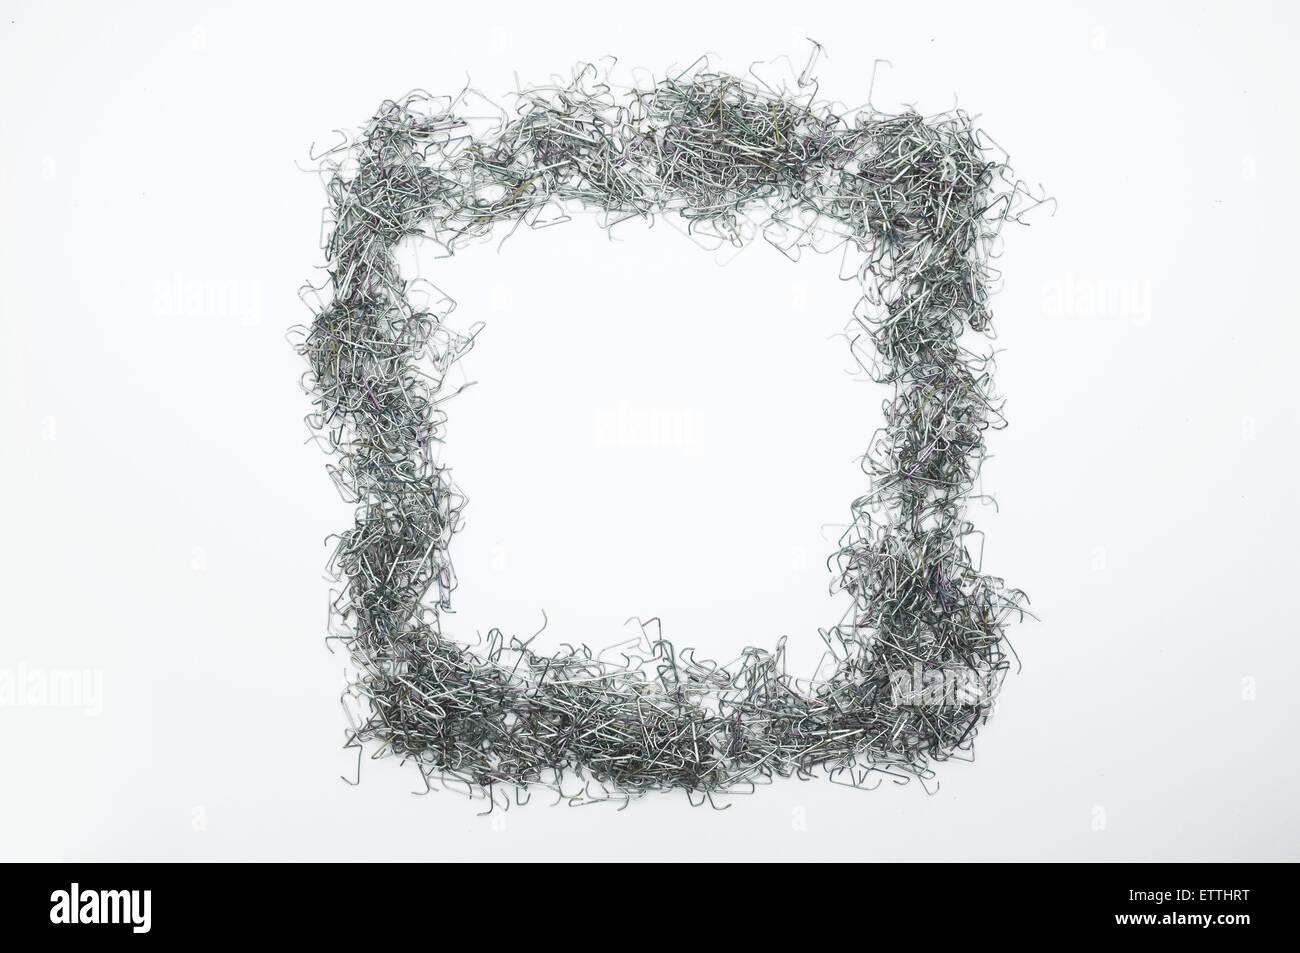 Used Staple Needle In Shape Of Square Rectangular Frame Stock Photo